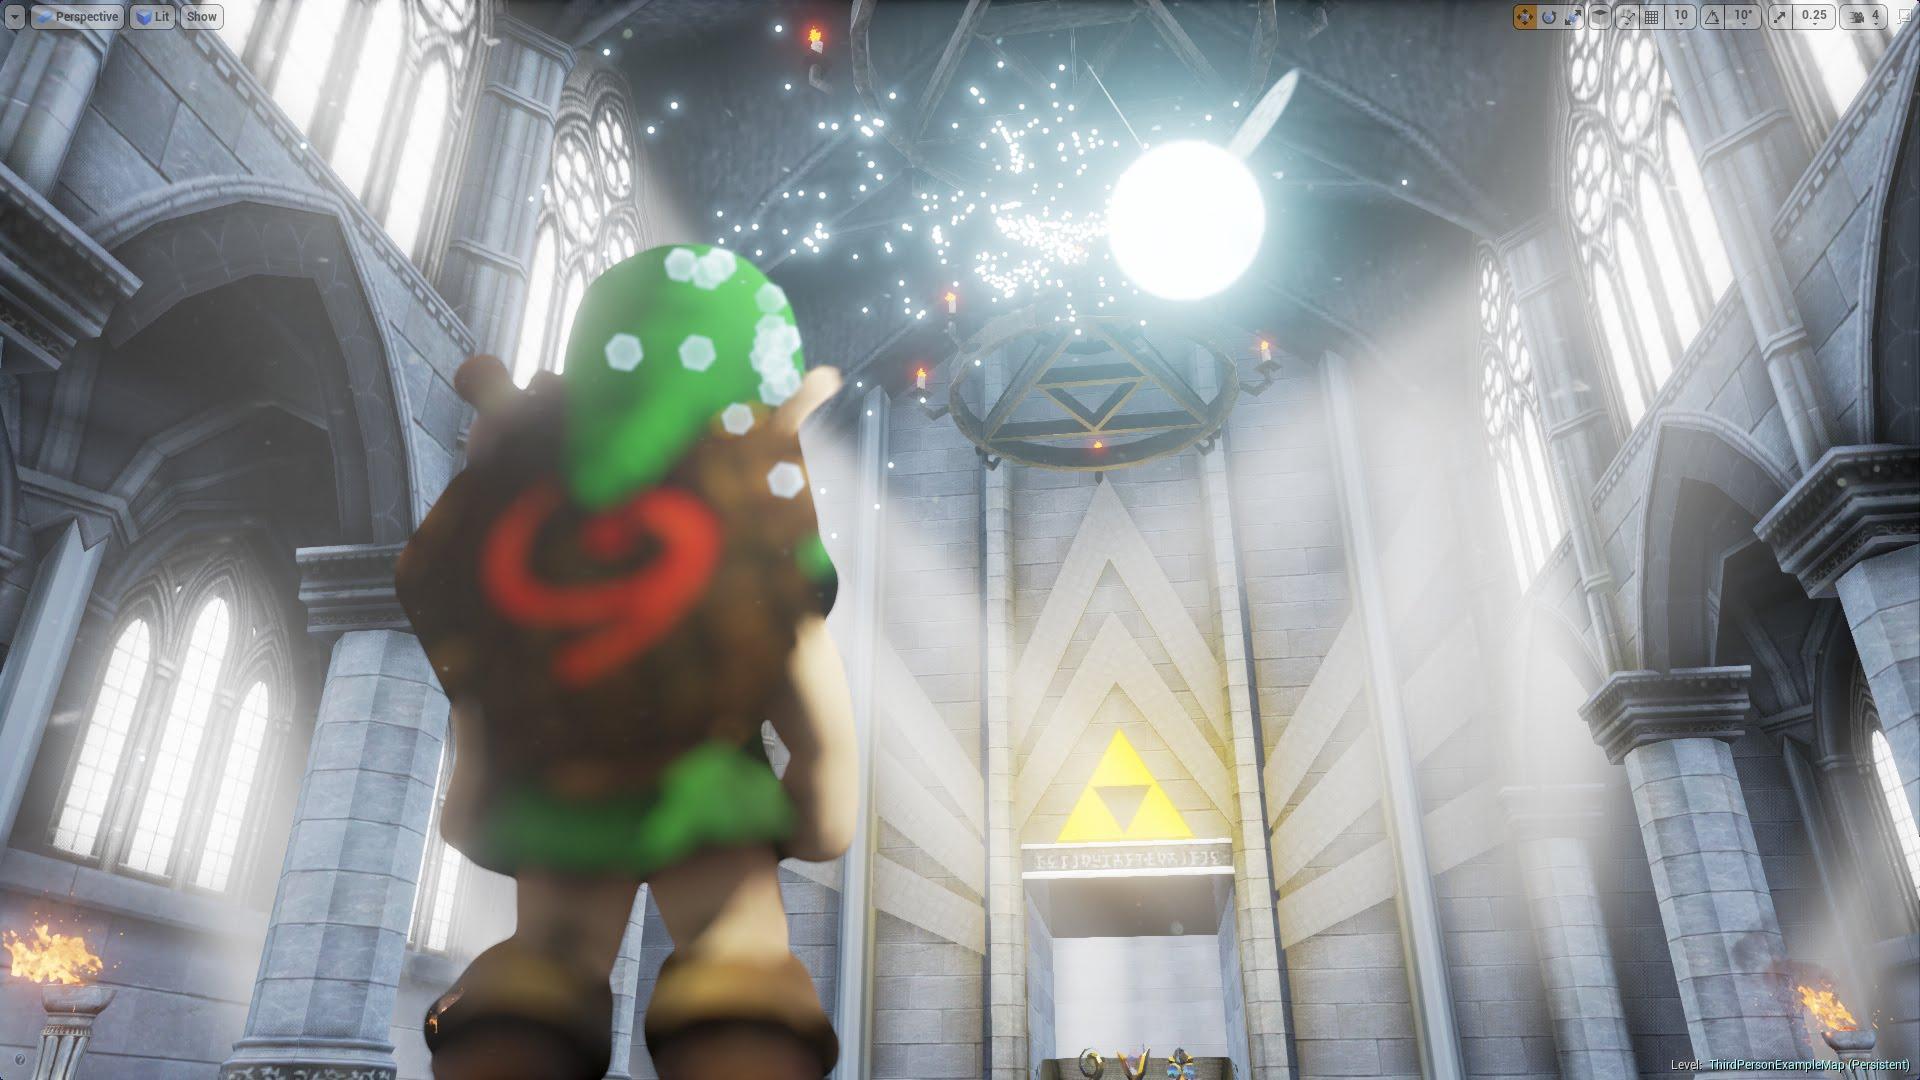 Fan's Playable HD Legend of Zelda Temple Makes the Wait for Nintendo's Next Zelda Excruciating